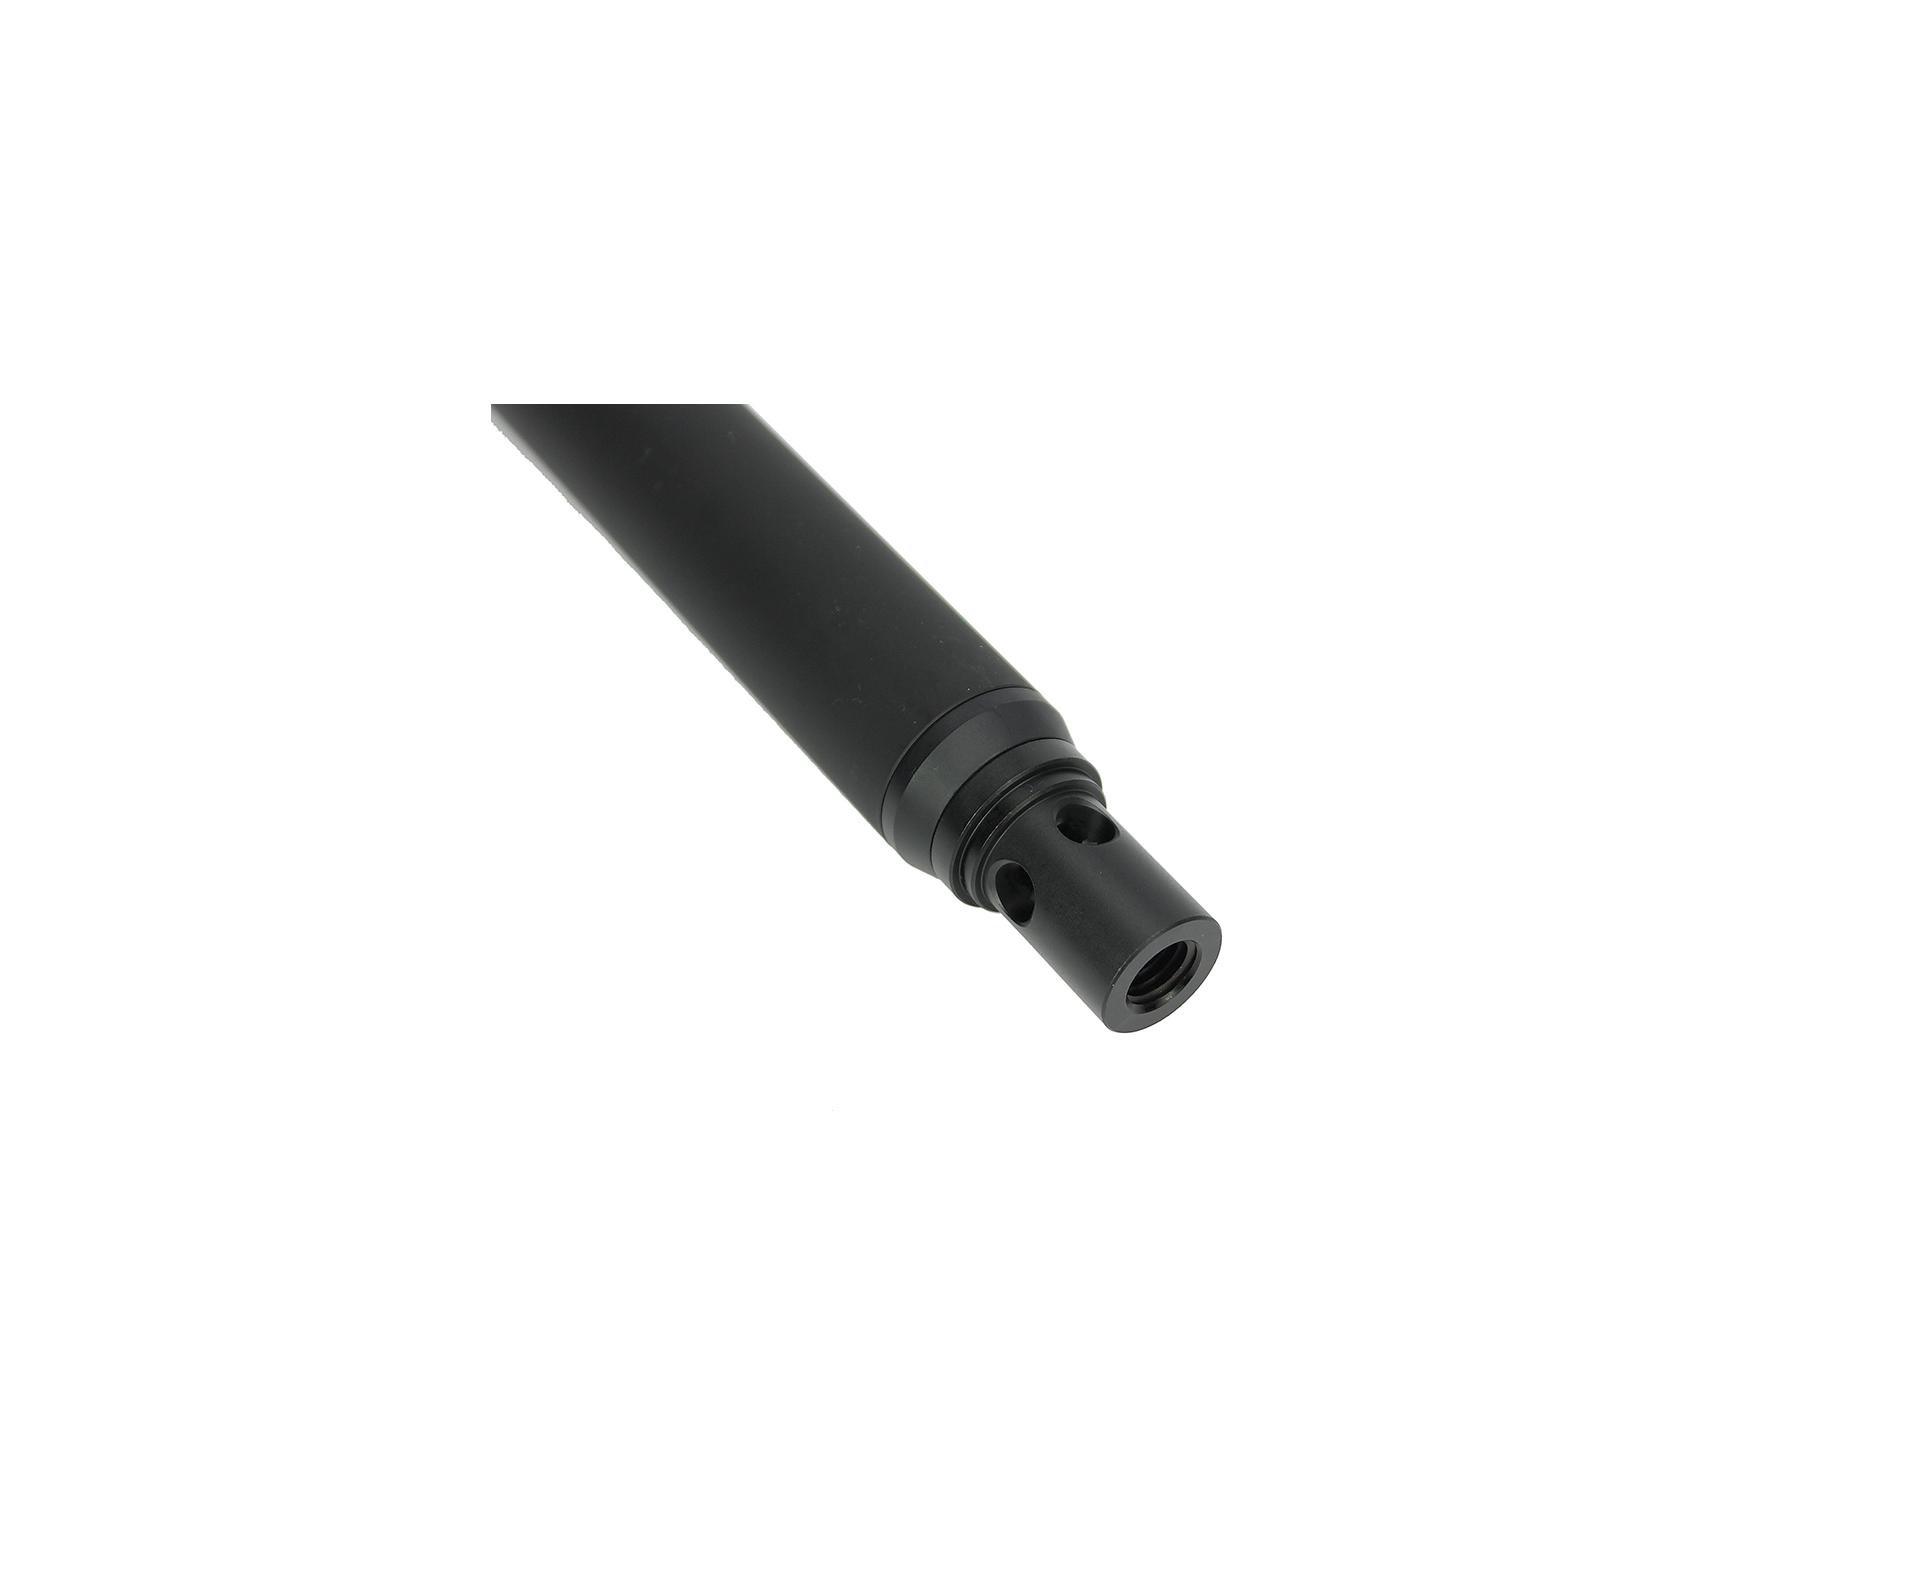 Carabina De Pressão Pcp M25 Thunder Black 5.5mm Artemis Fxr